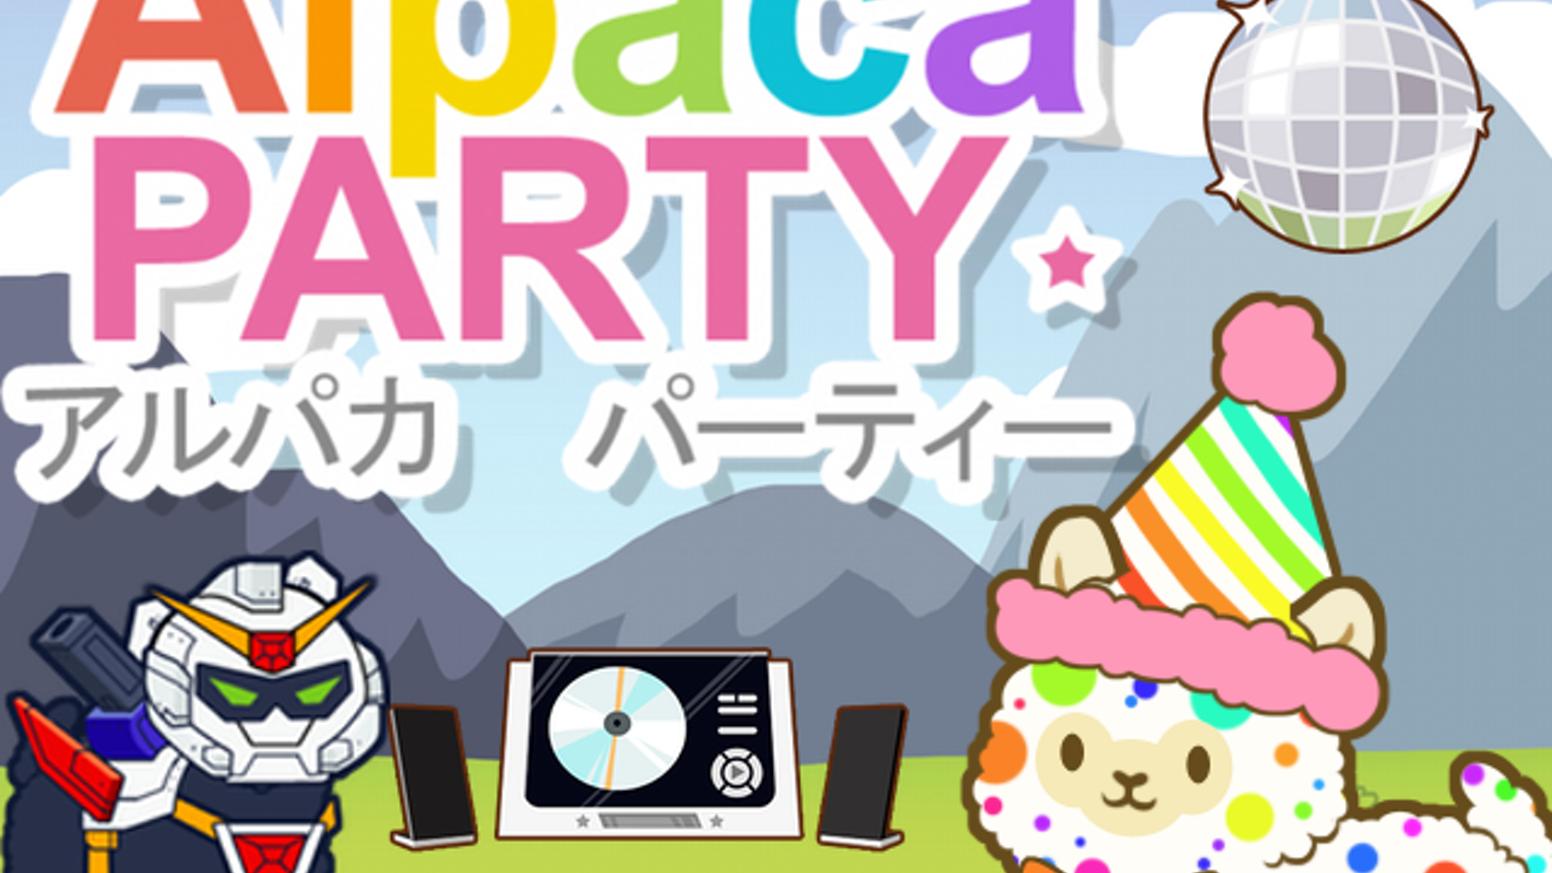 Alpaca clipart party. By meowpuff games kickstarter